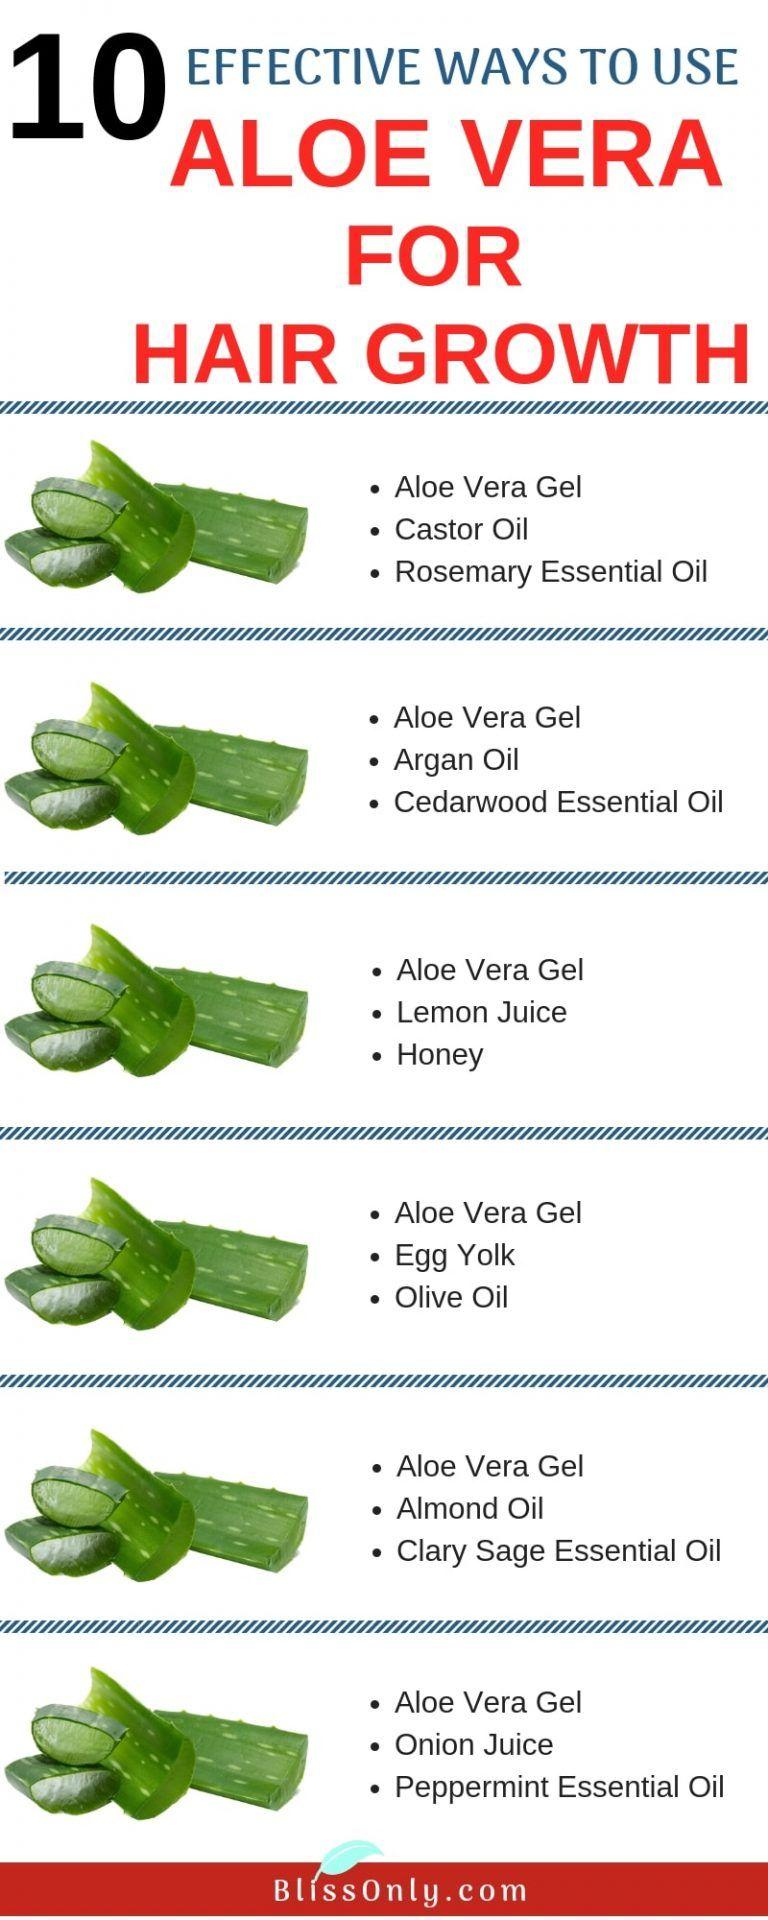 10 Effective Ways To Use Aloe Vera For Hair Growth Aloe Vera For